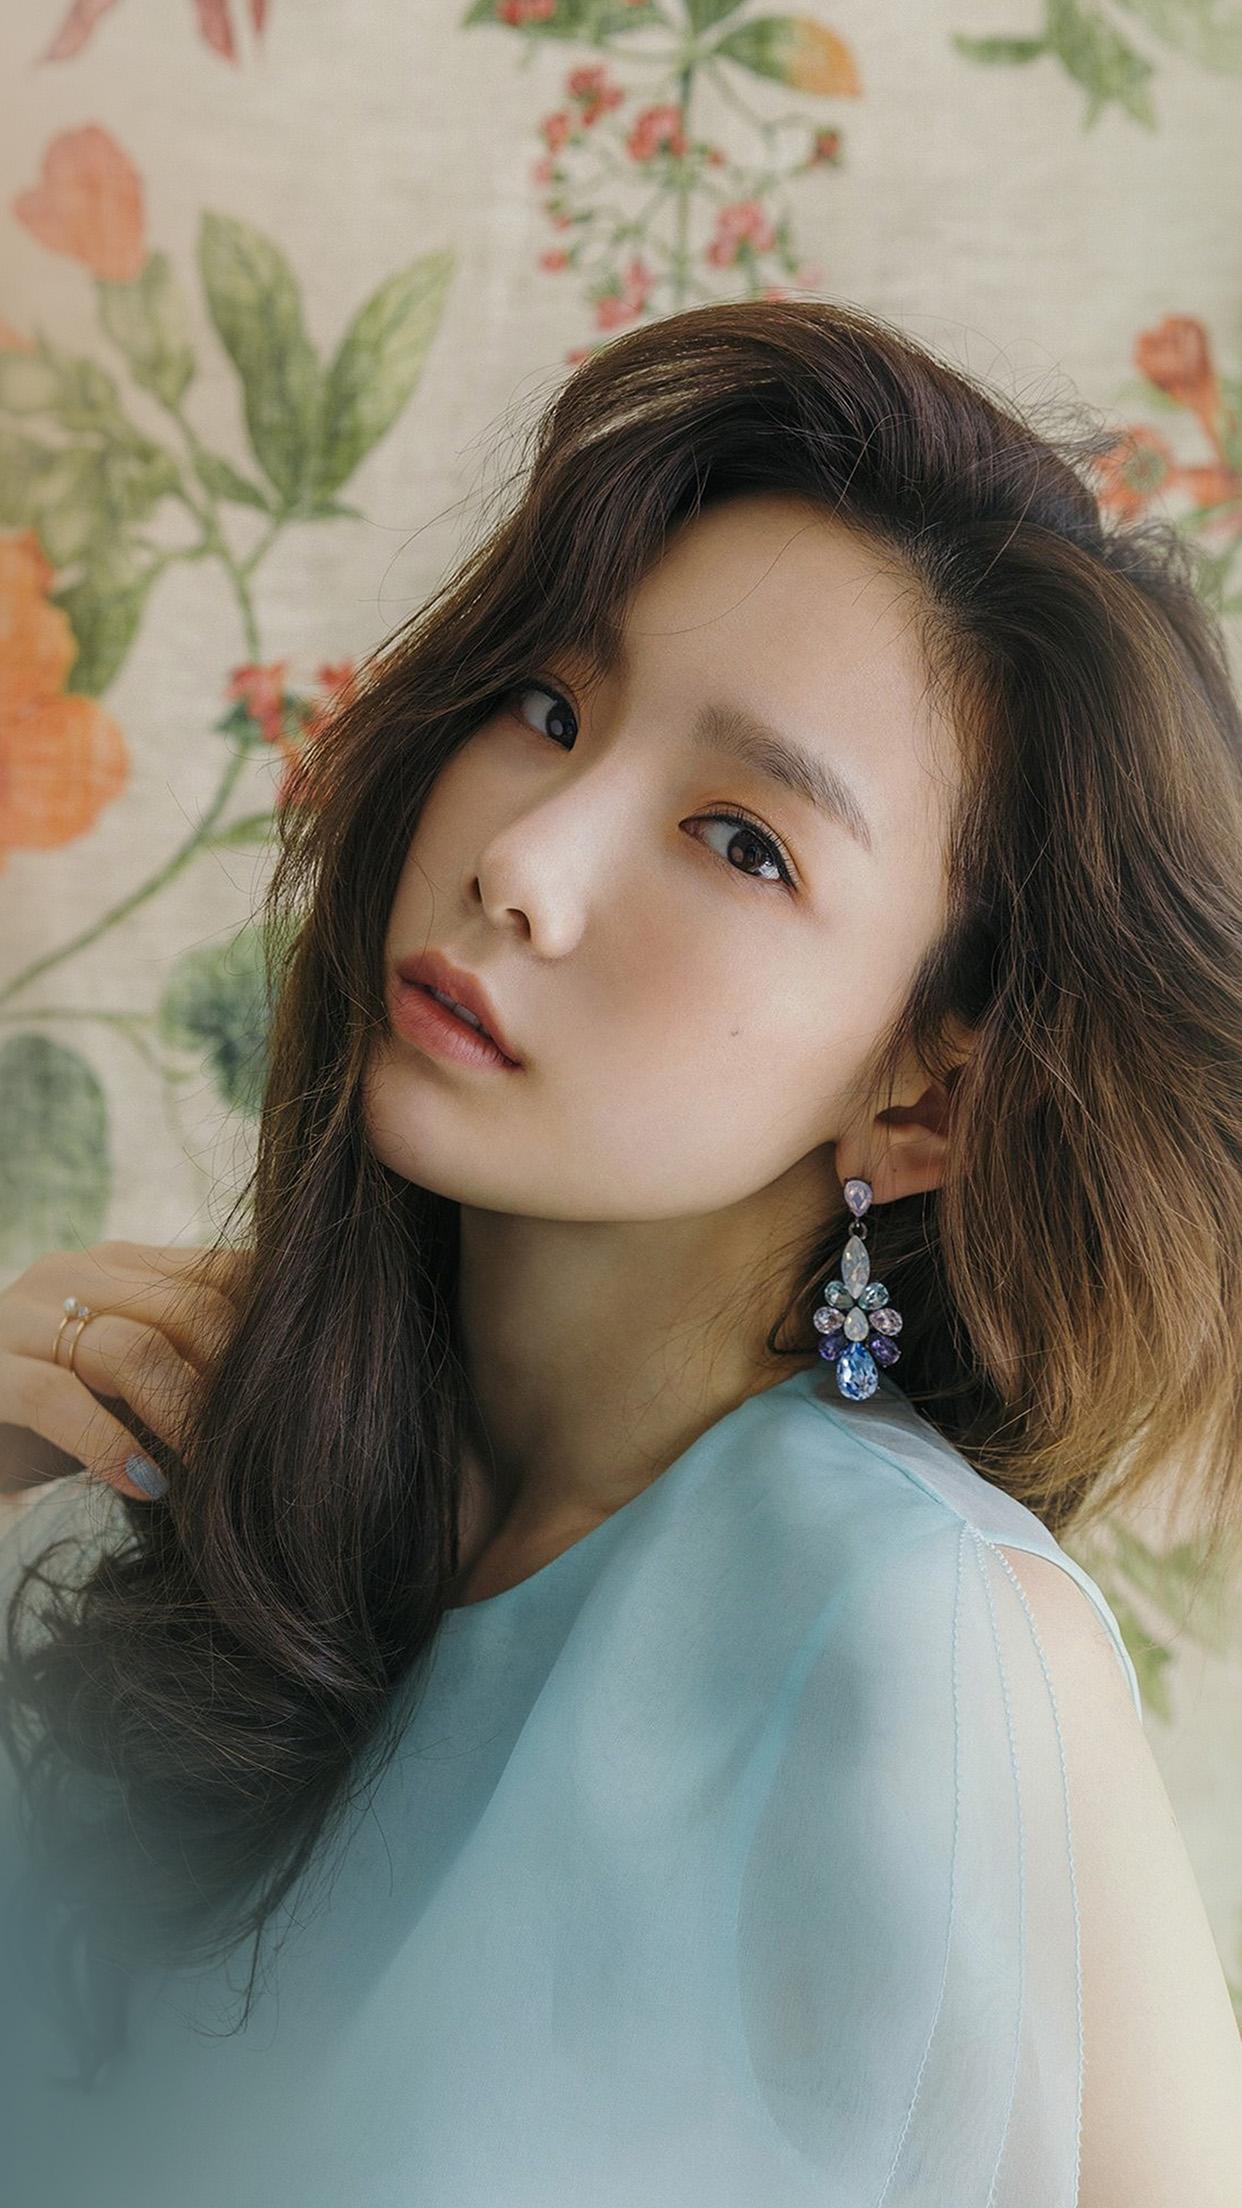 Victoria Secret Wallpaper Iphone 5 Hm37 Kpop Snsd Taeyeon Flower Girl